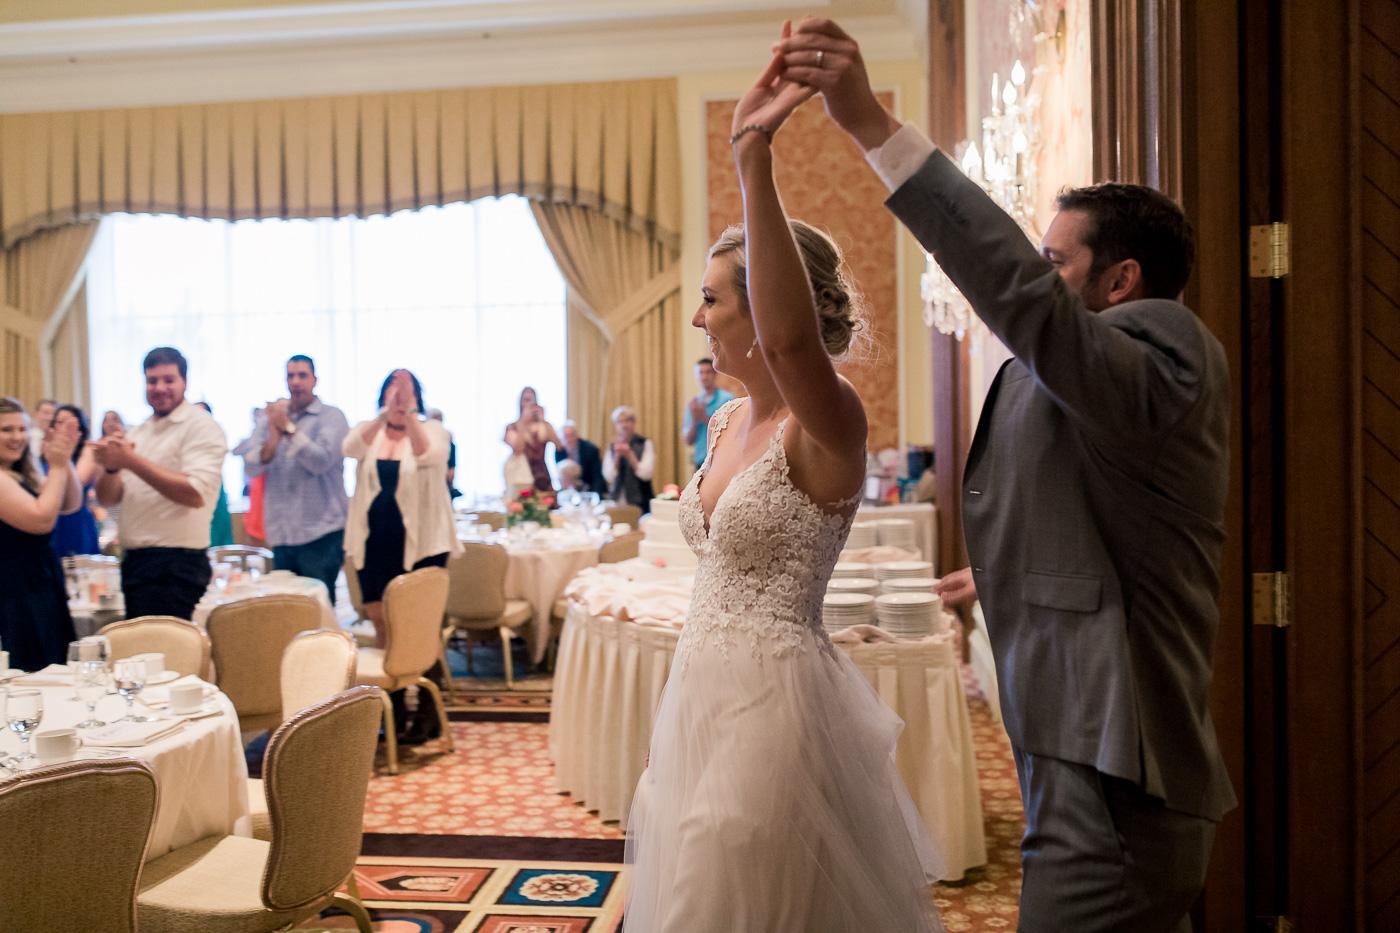 Little America Wedding Reception in Cheyenne By Megan Lee Photography